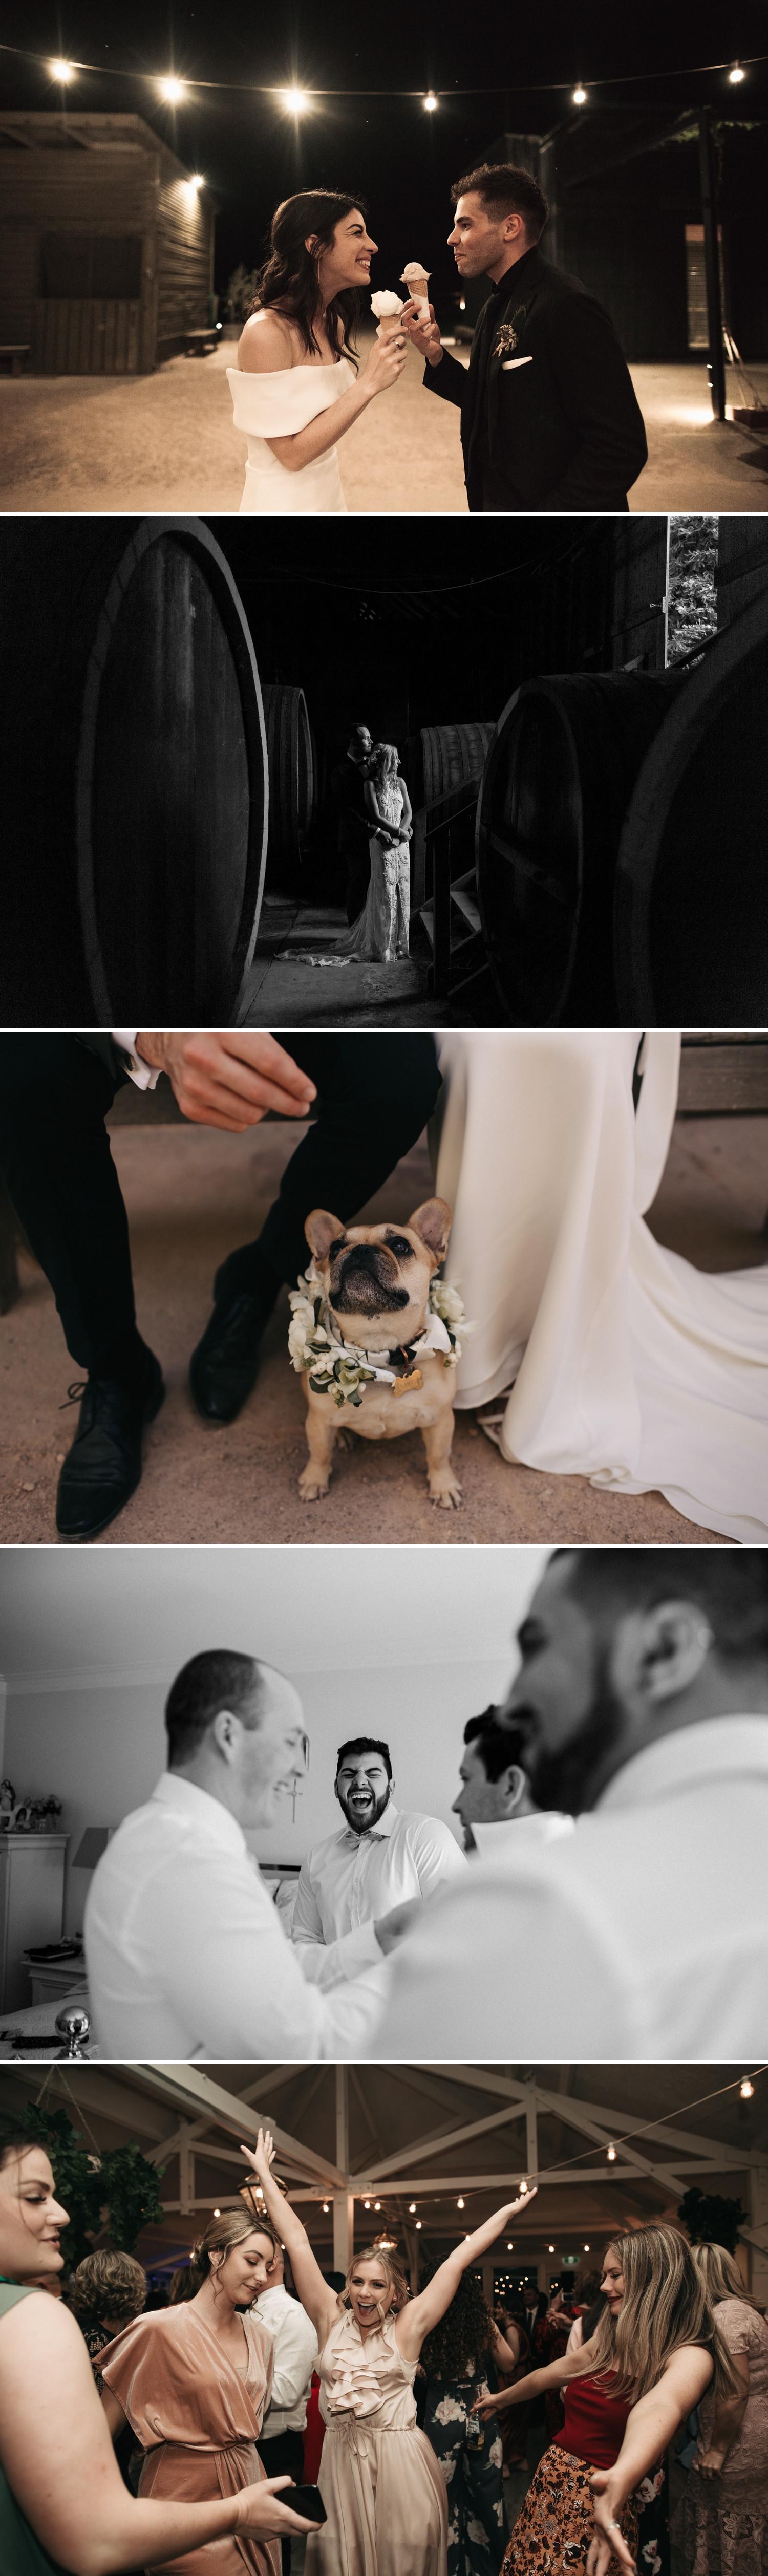 relaxed-wedding-photographer-melbourne_0018.jpg